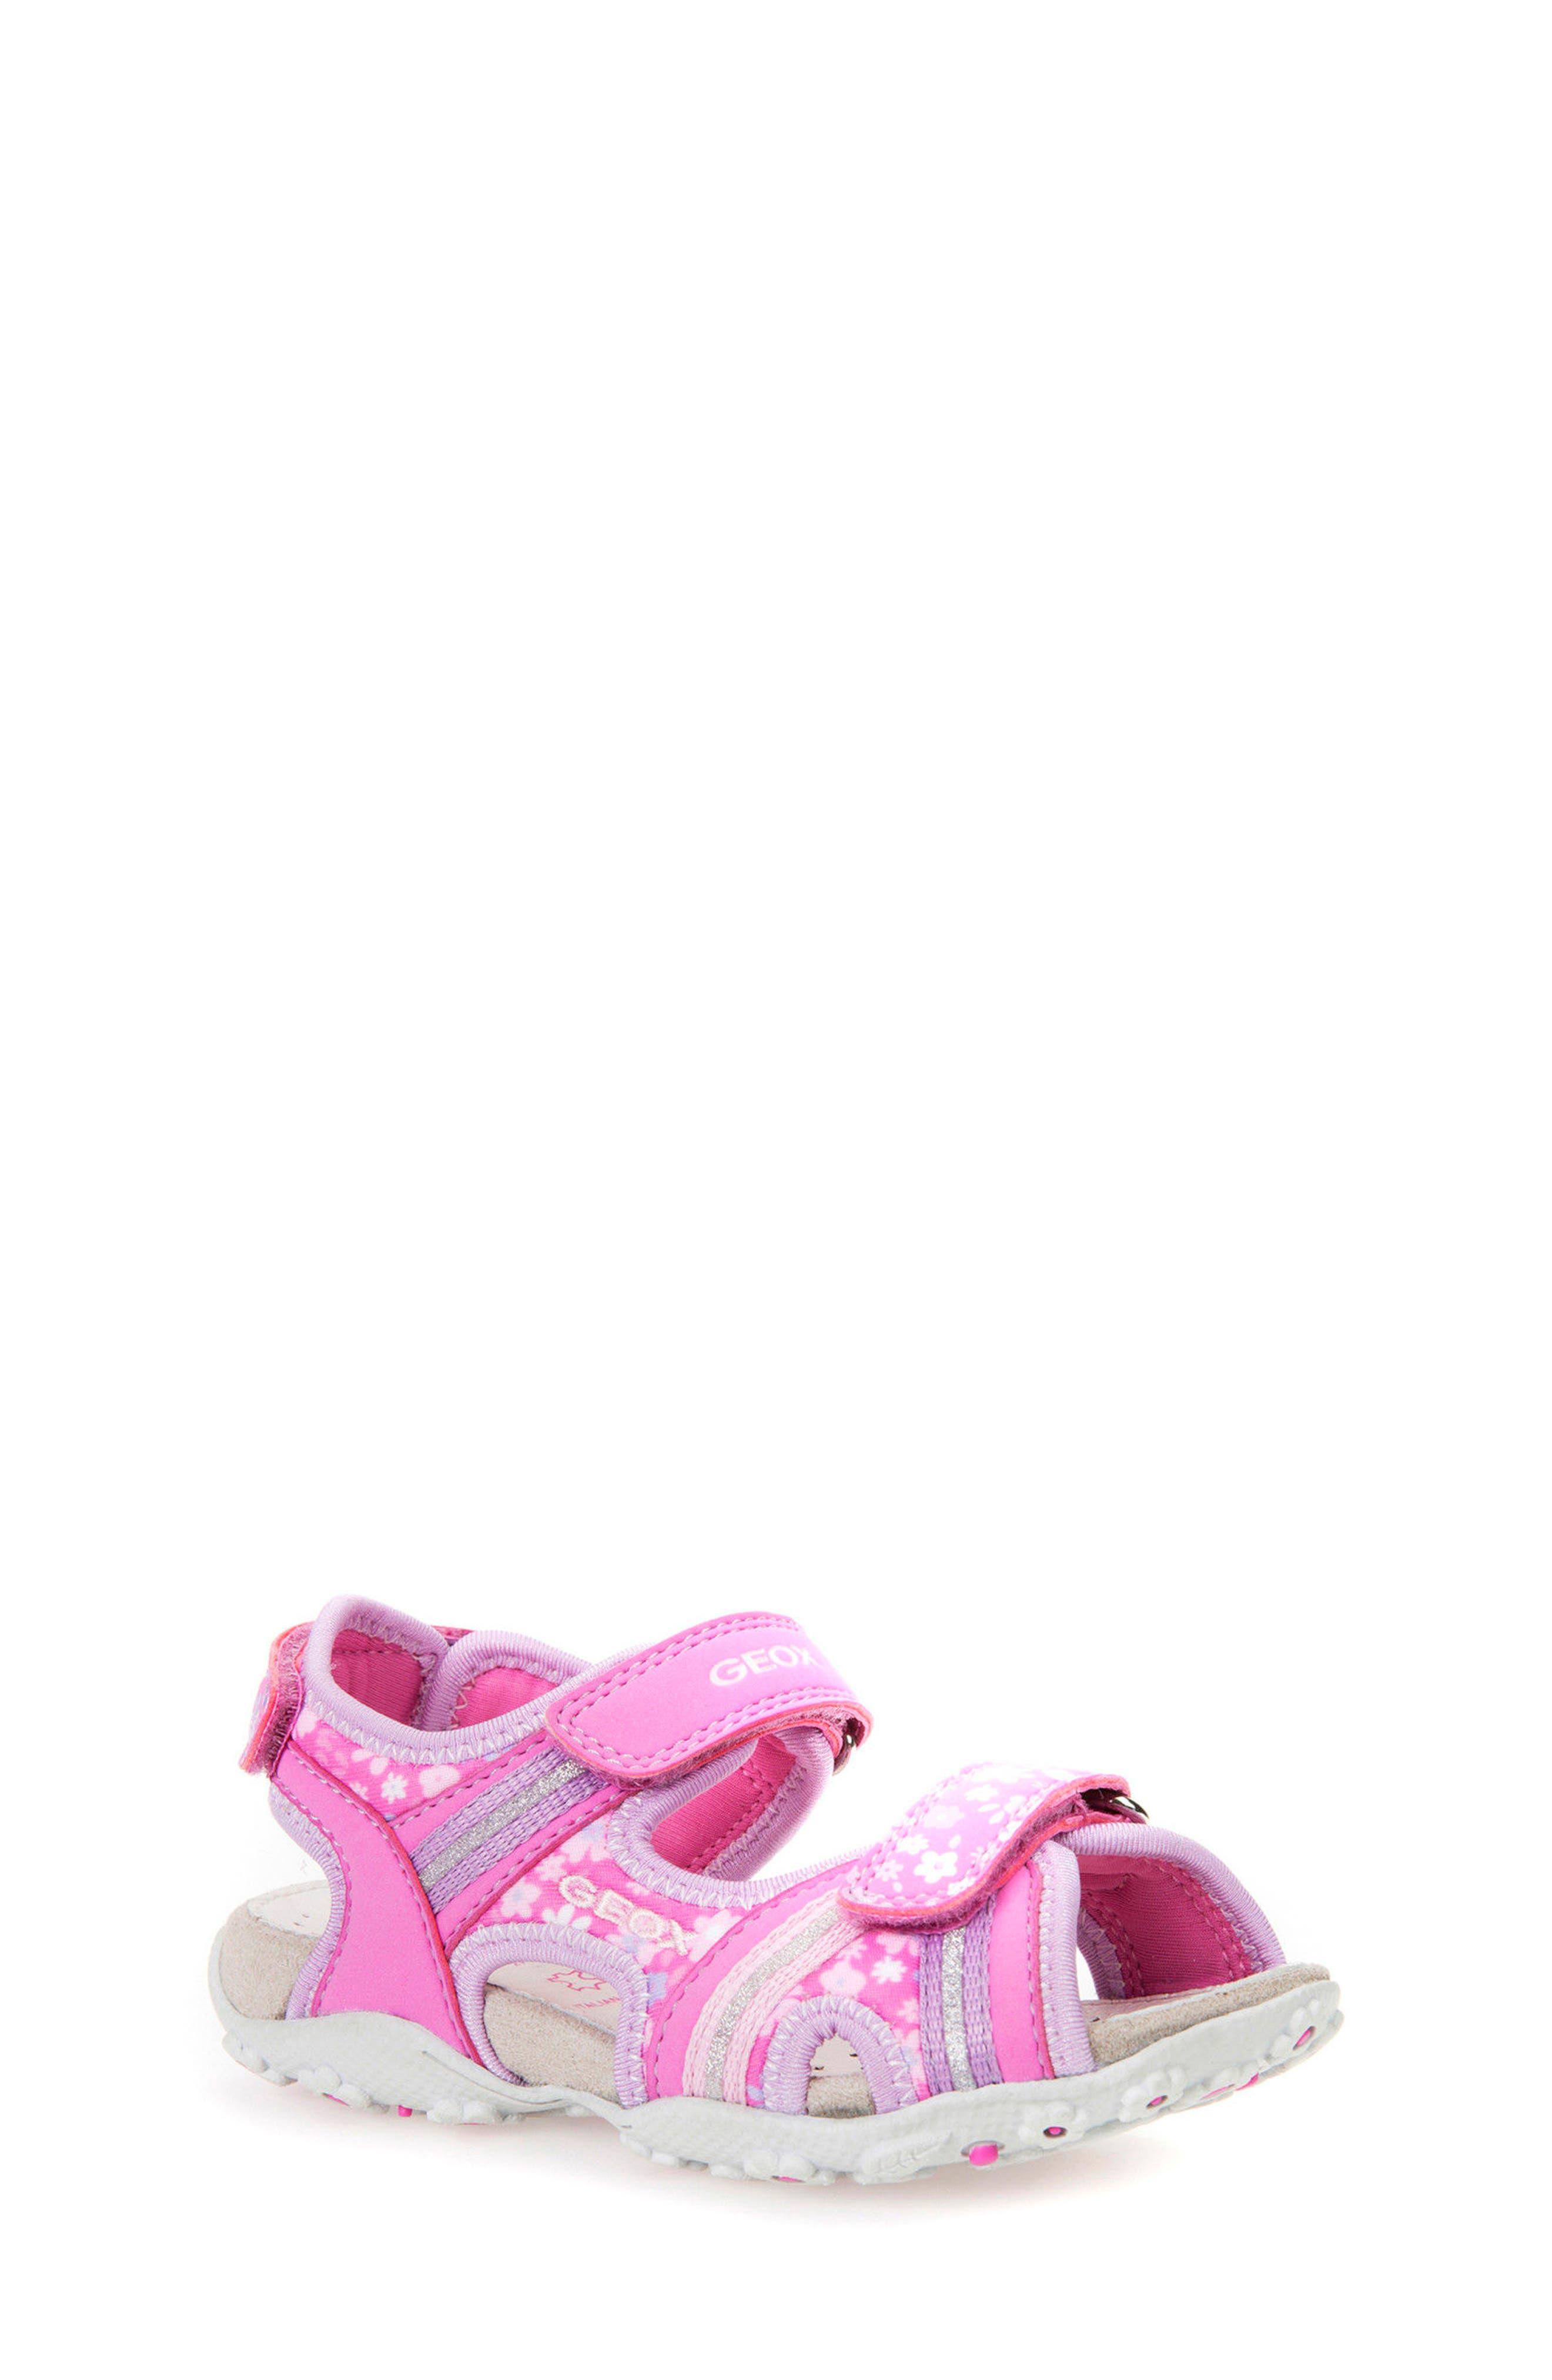 Geox 'Roxanne' Sandal (Toddler, Little Kid & Big Kid)